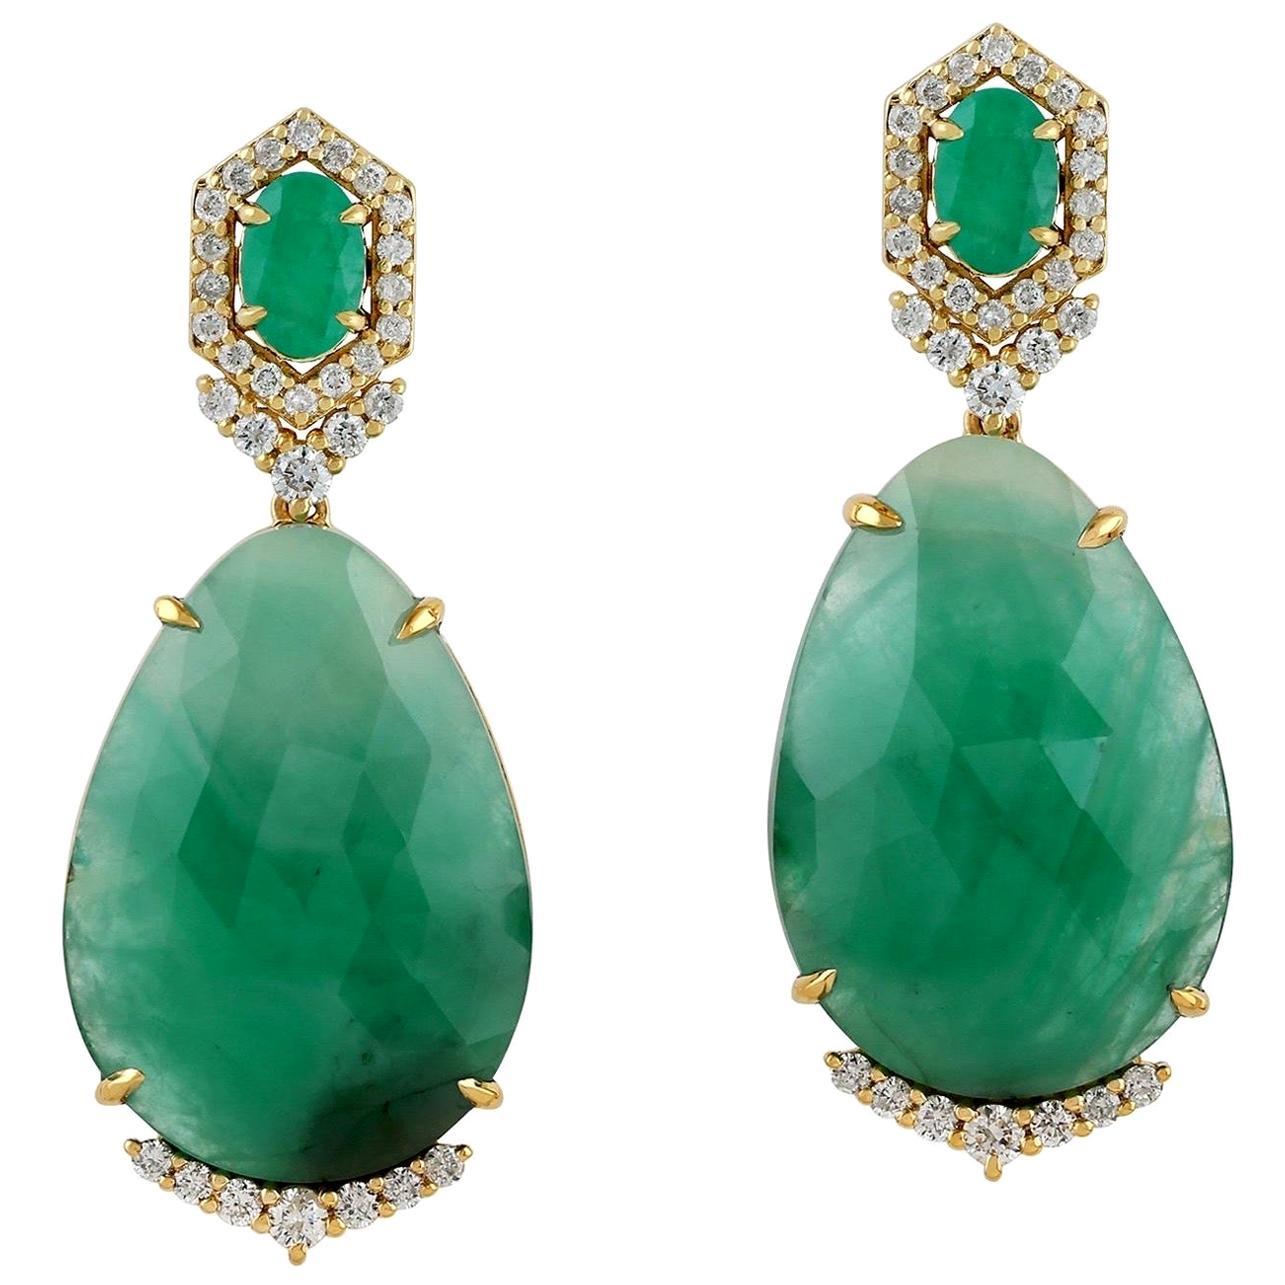 21.43 Carat Emerald Diamond 18 Karat Gold Earrings